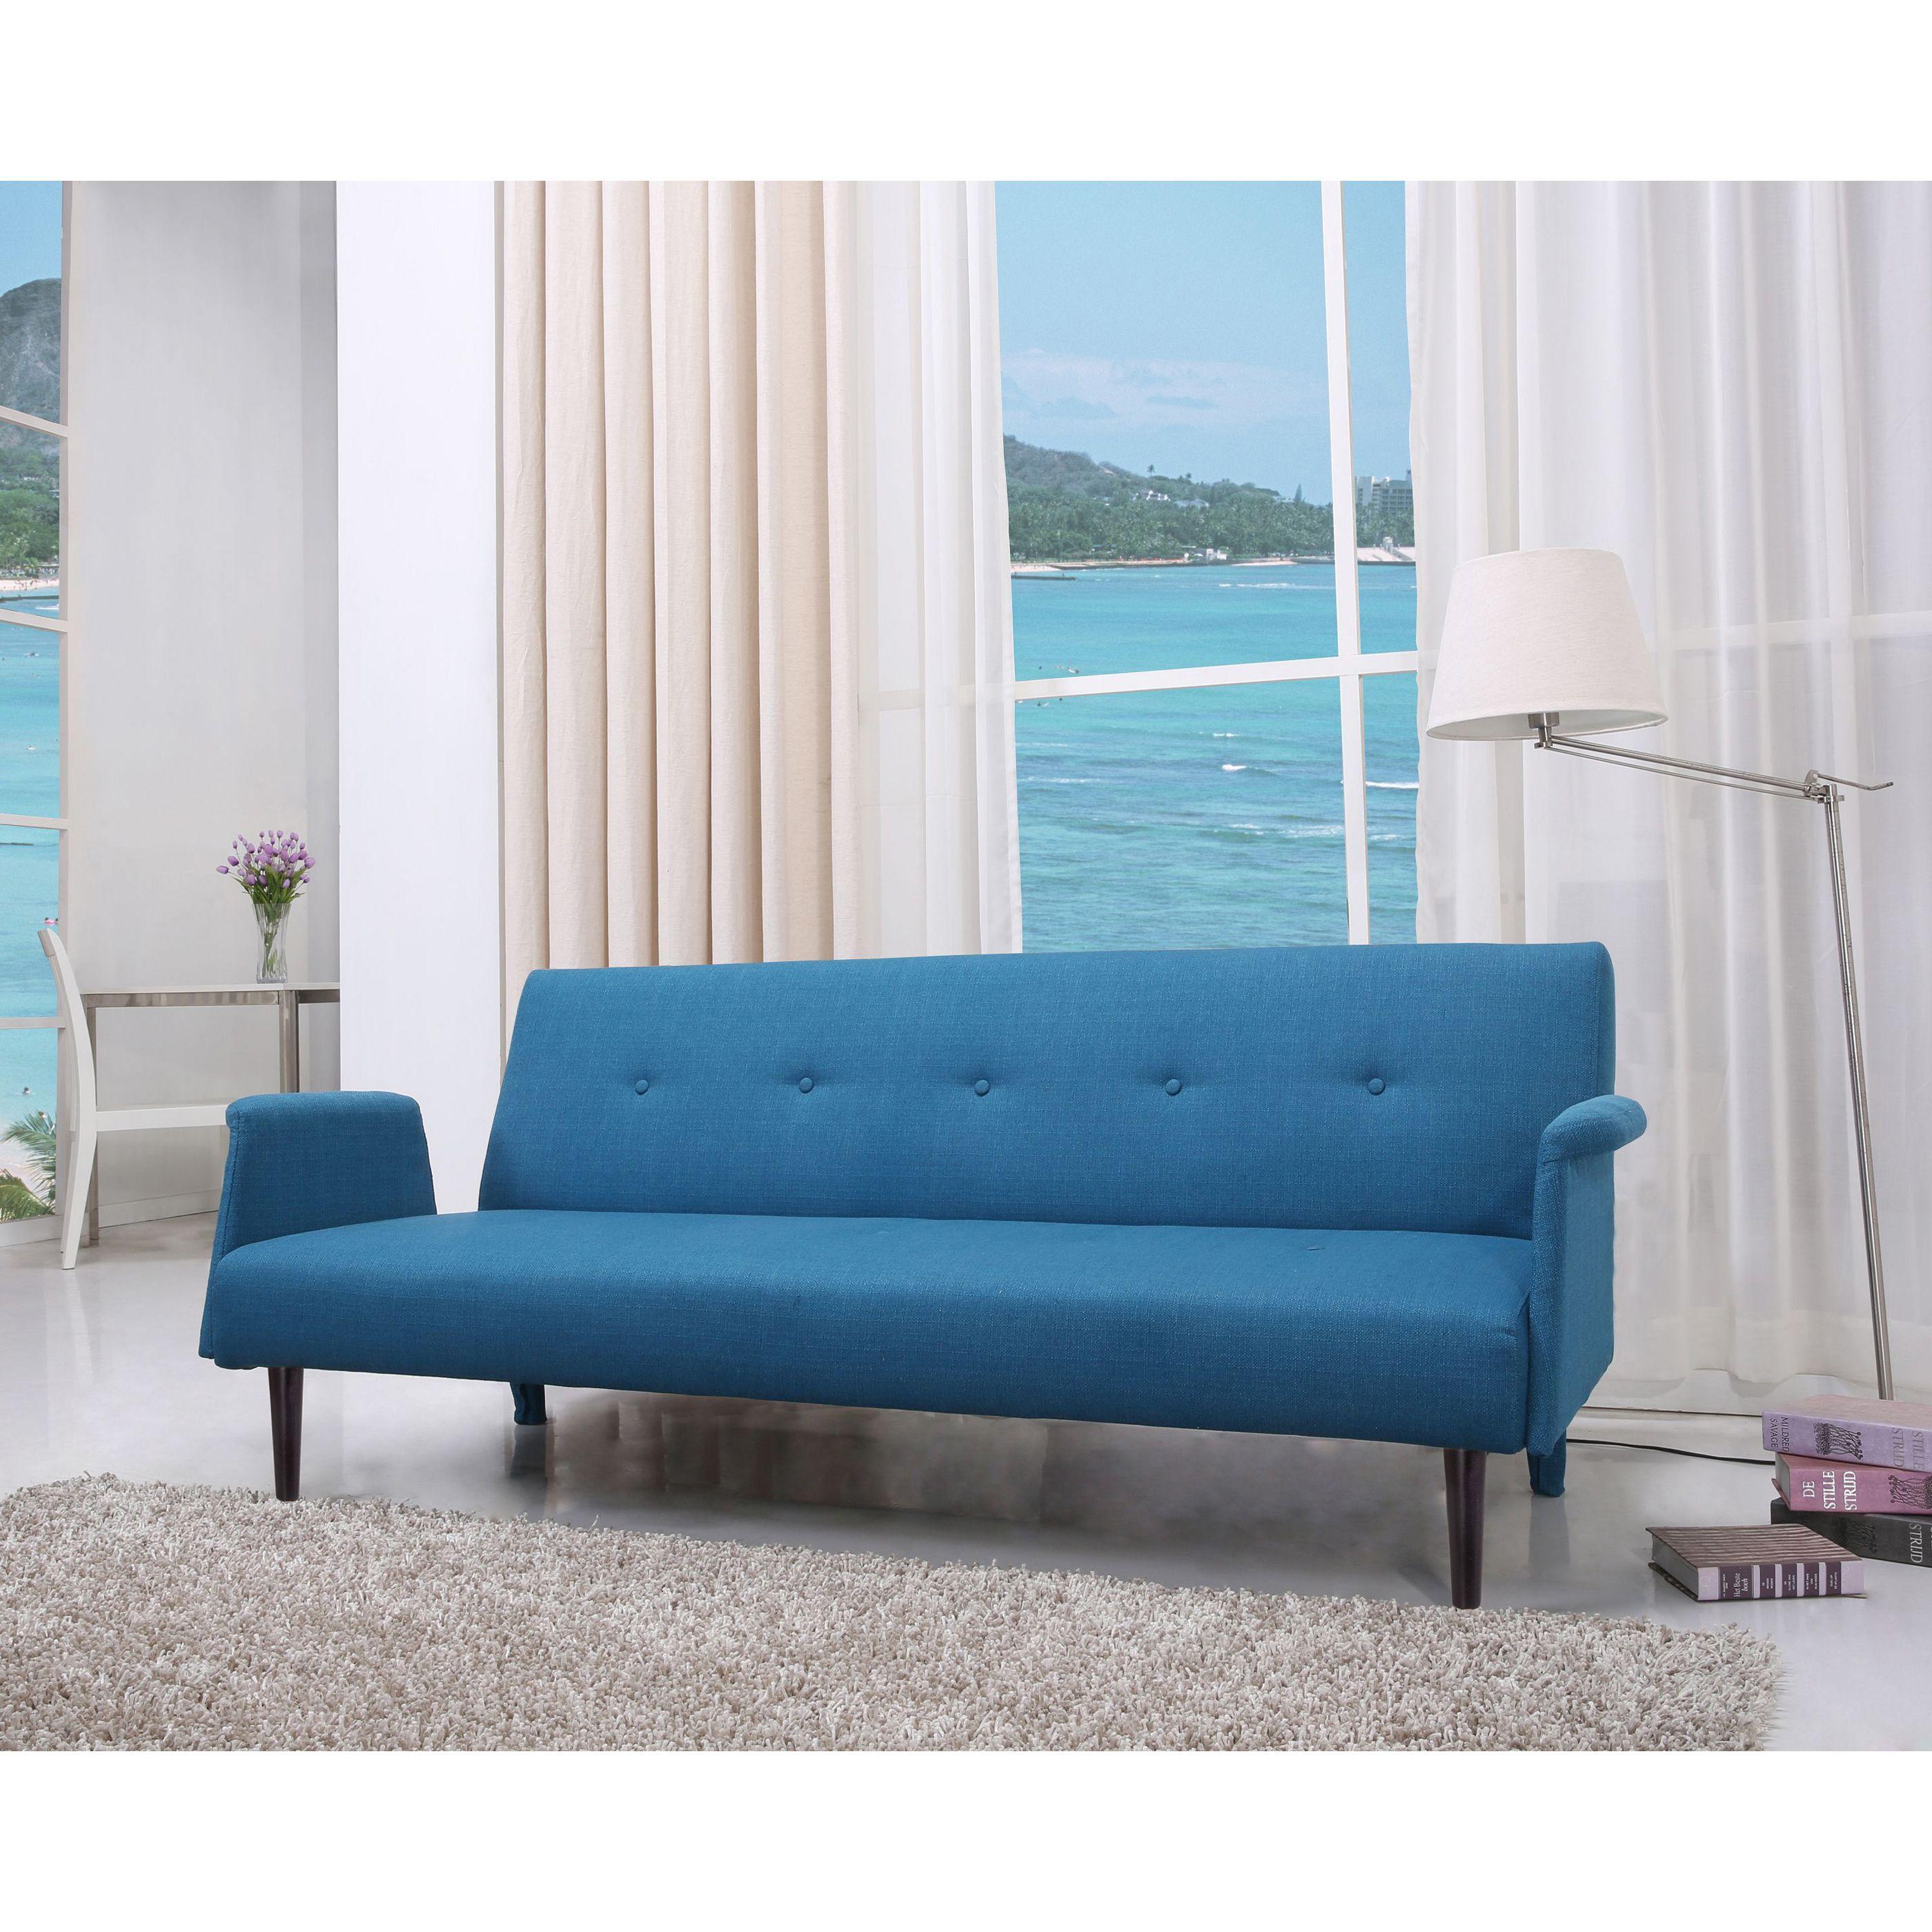 Best Sofa Sleeper: Bedding, Furniture, Electronics, Jewelry